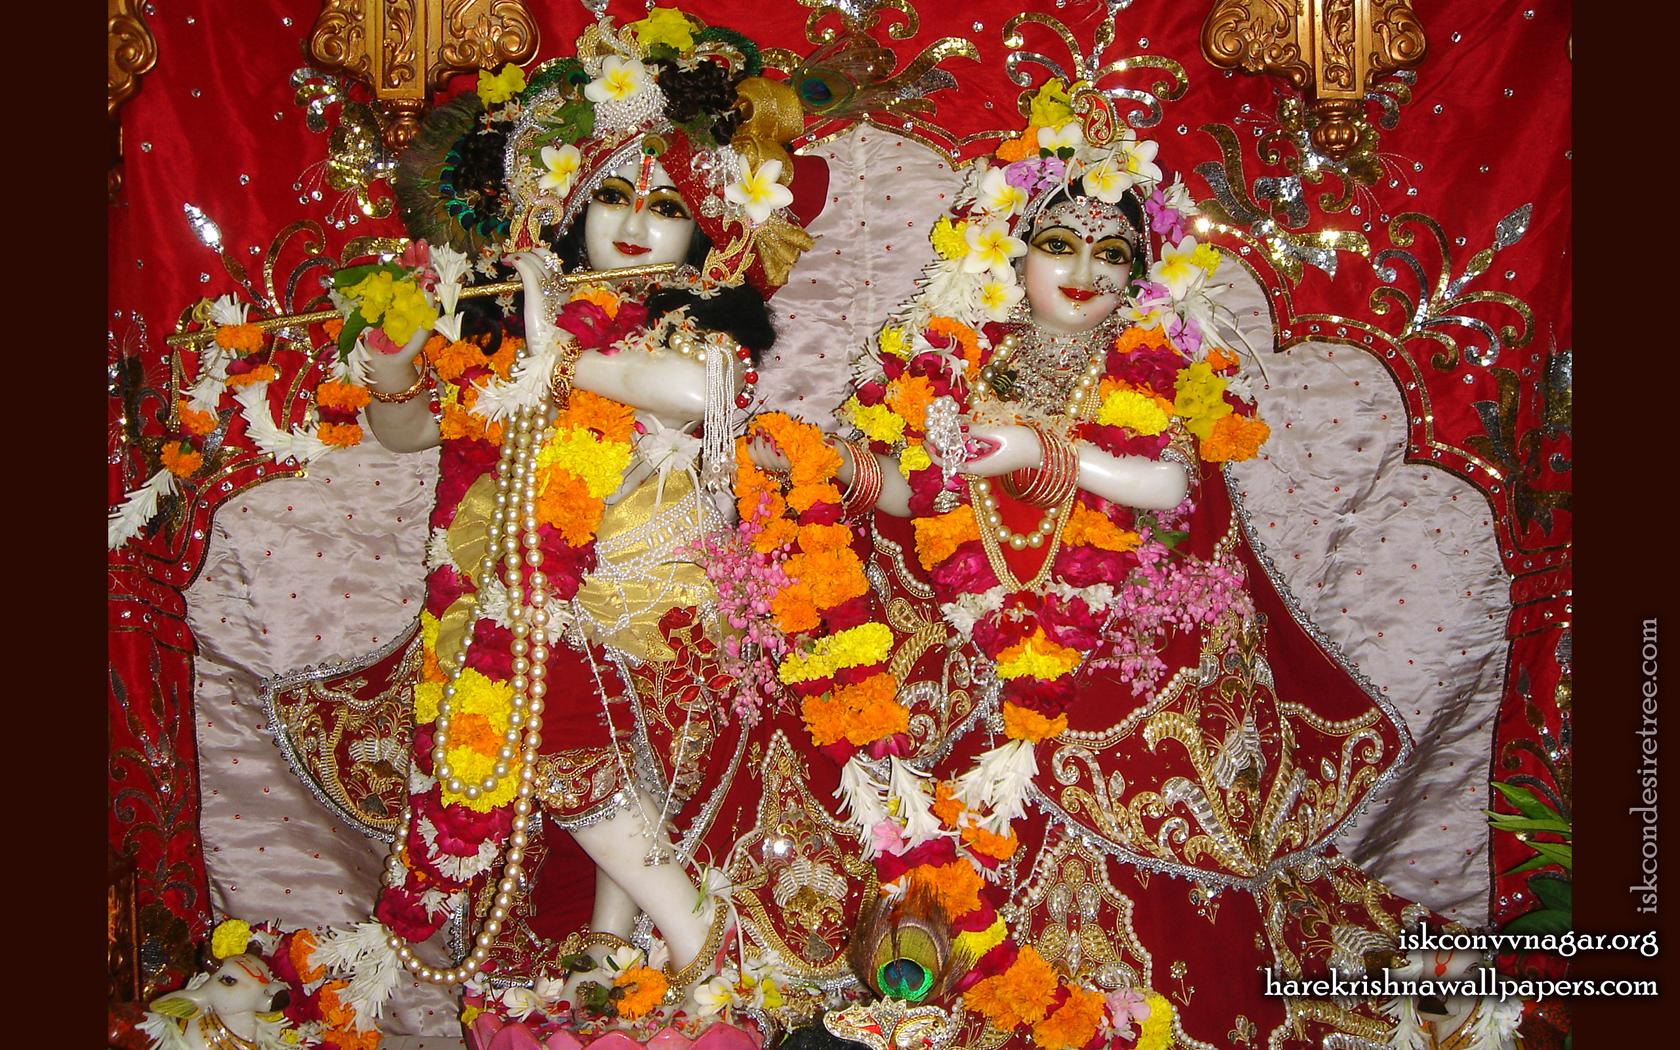 Sri Sri Radha Giridhari Wallpaper (027) Size 1680x1050 Download